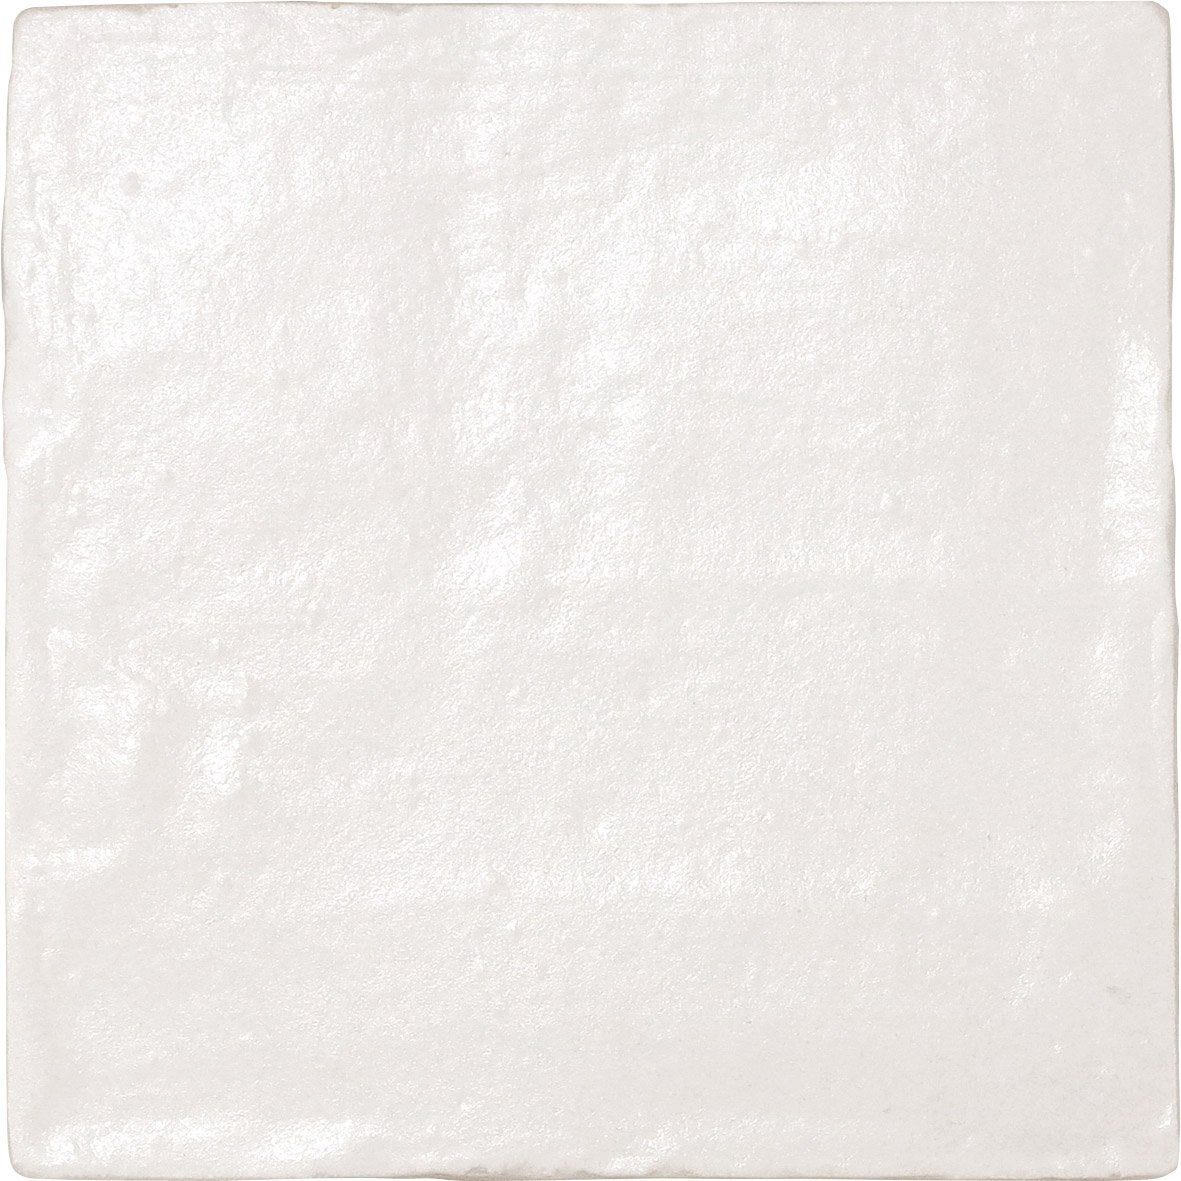 Carrelage mur pierre blanc nacrée l.10 x L.10 cm, Ibiza